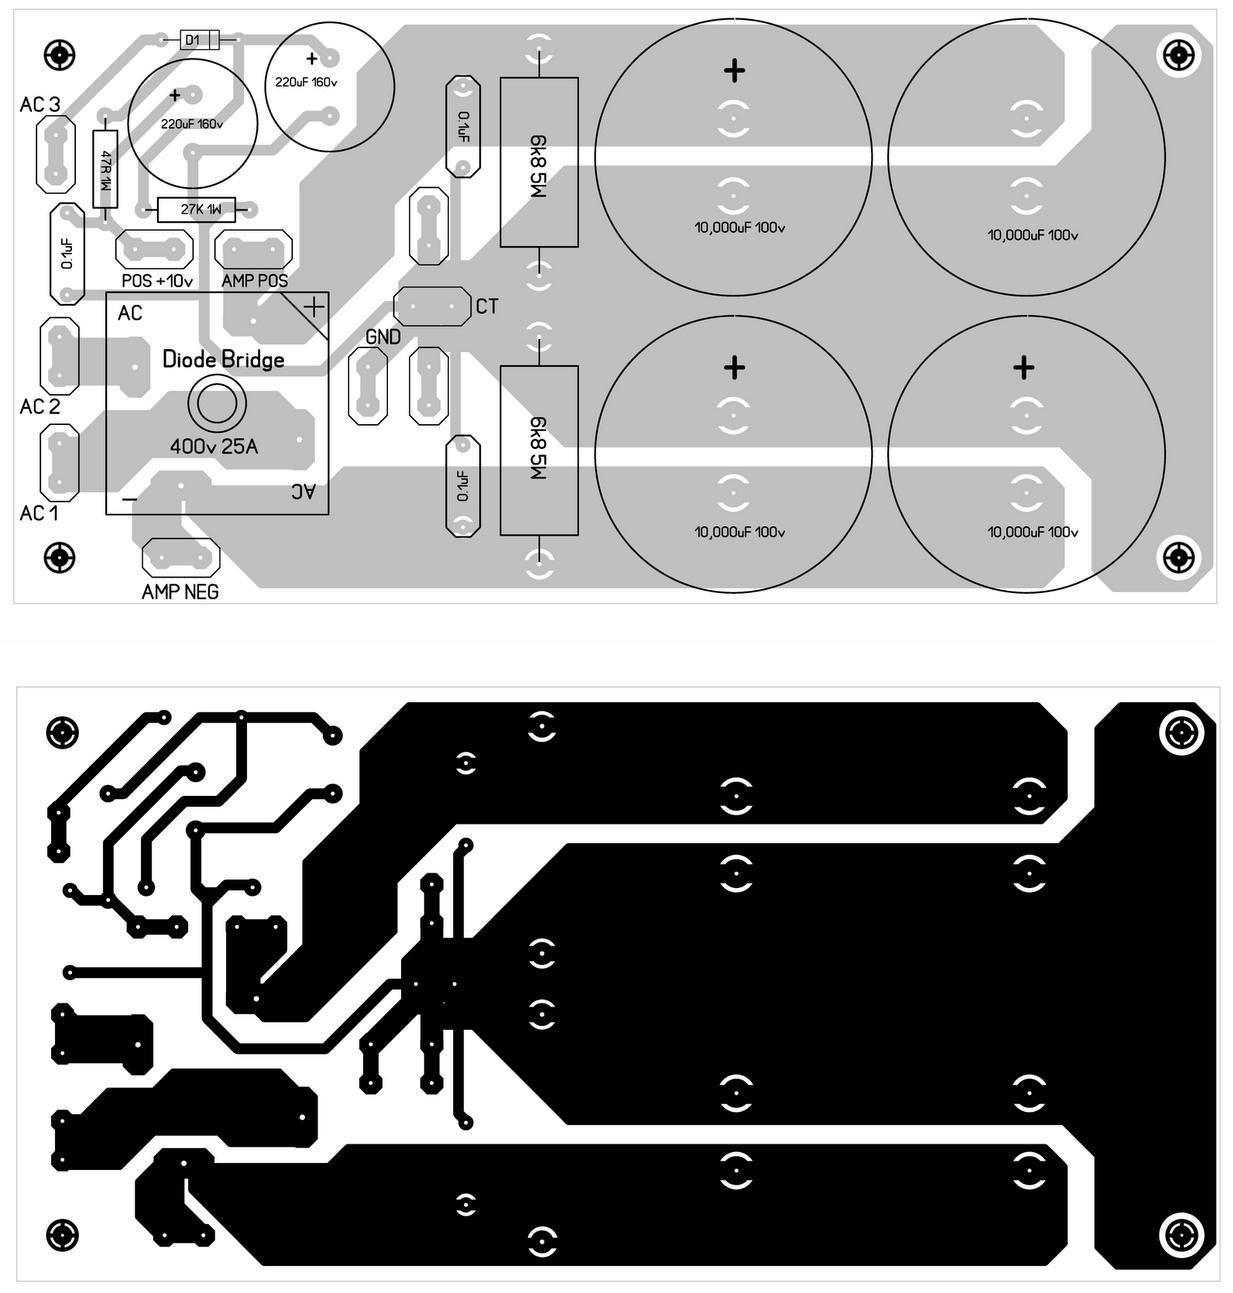 600 Watt Mosfet Power Amplifier Diagram With Pcb